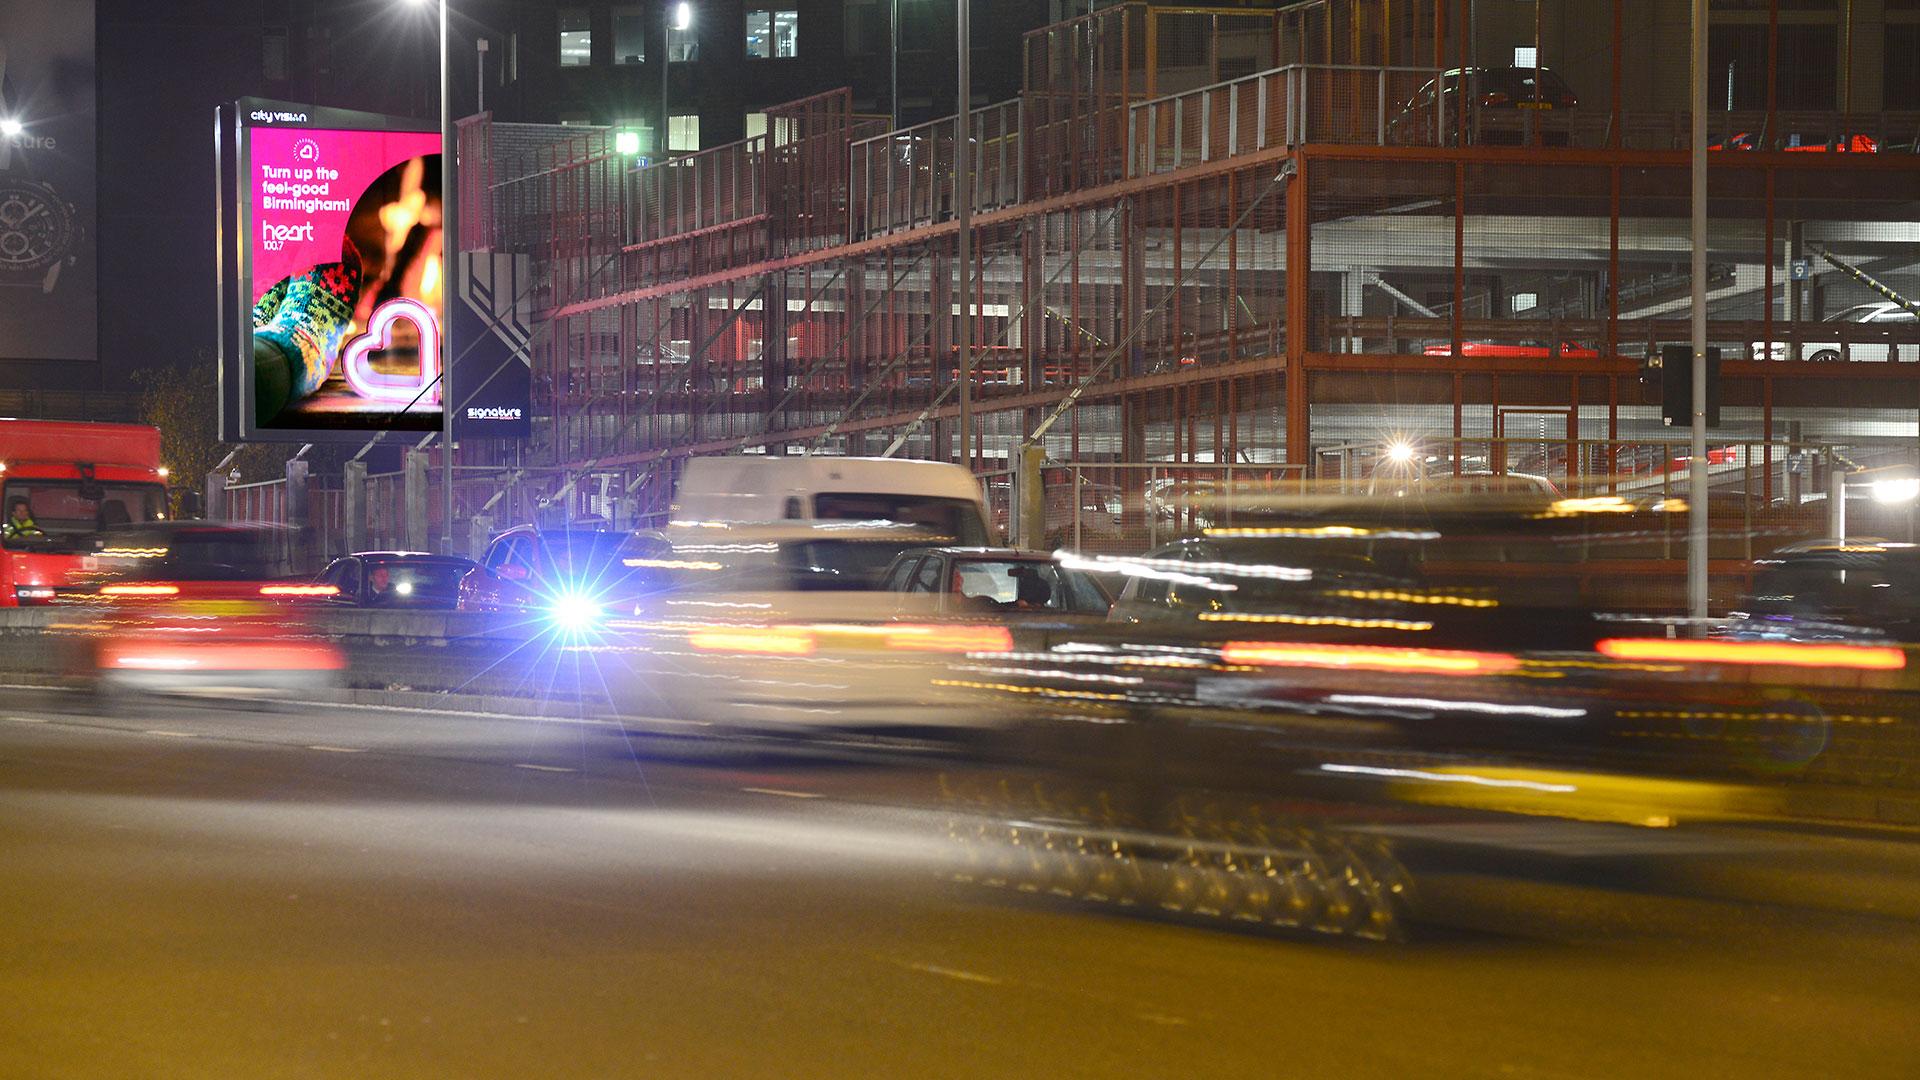 CityVision-Brunel-Street-2